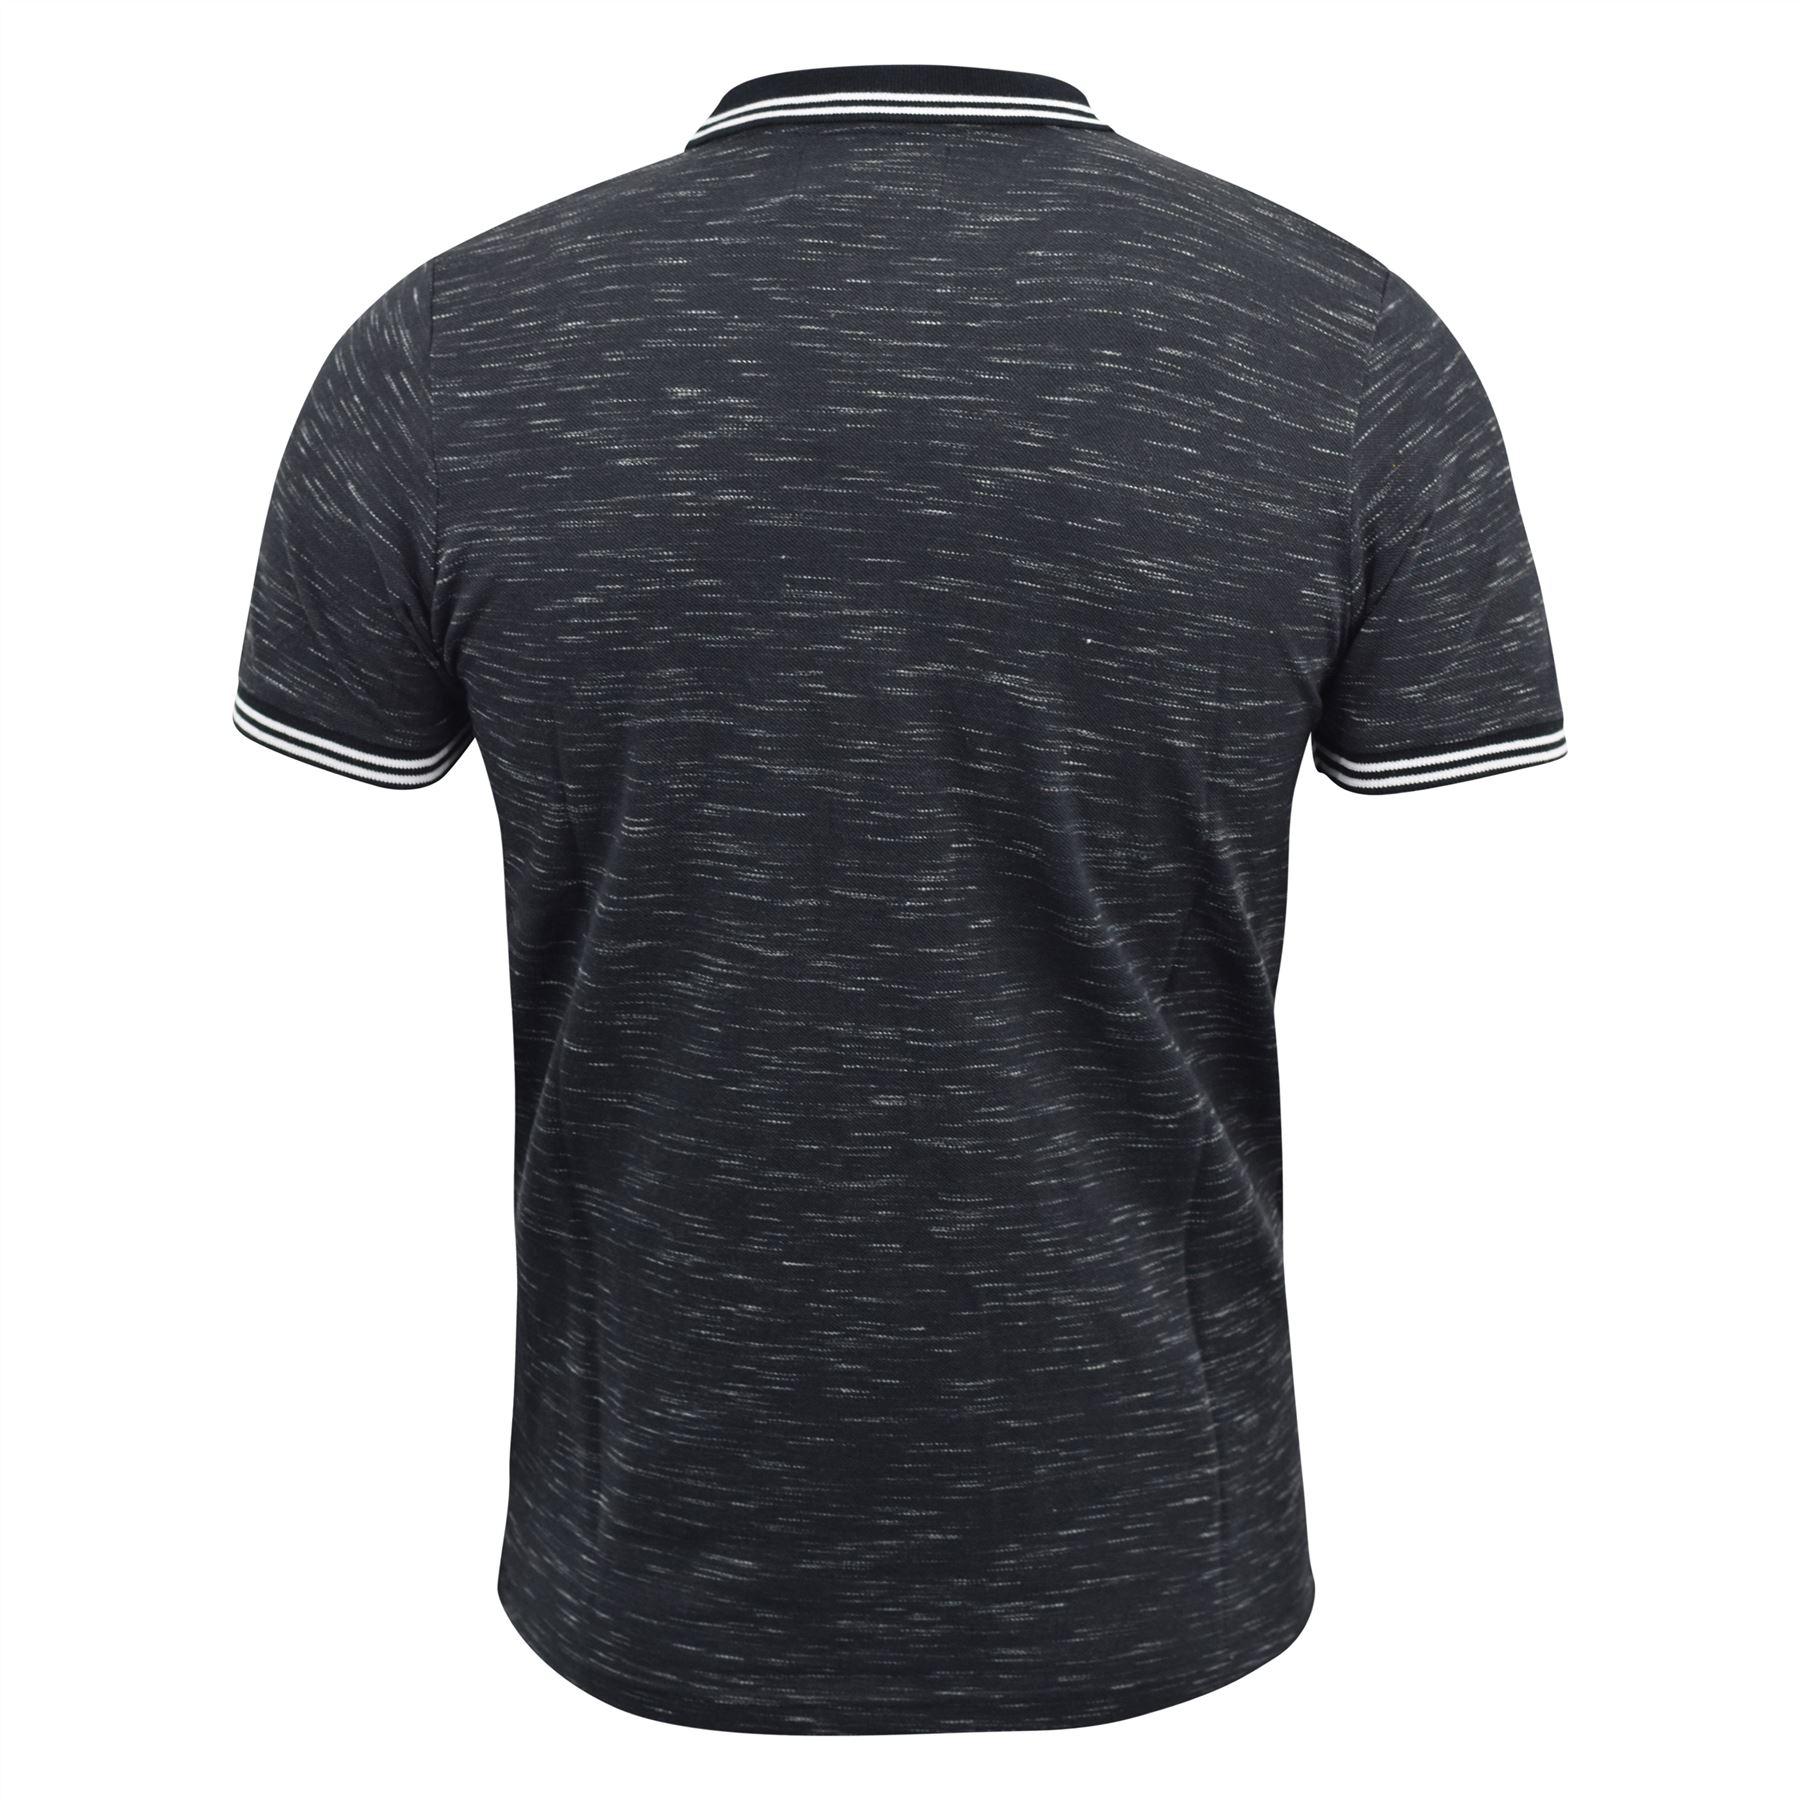 Mens-Polo-Shirt-kangol-Short-Sleeve-T-Shirt-Top-Jack thumbnail 3